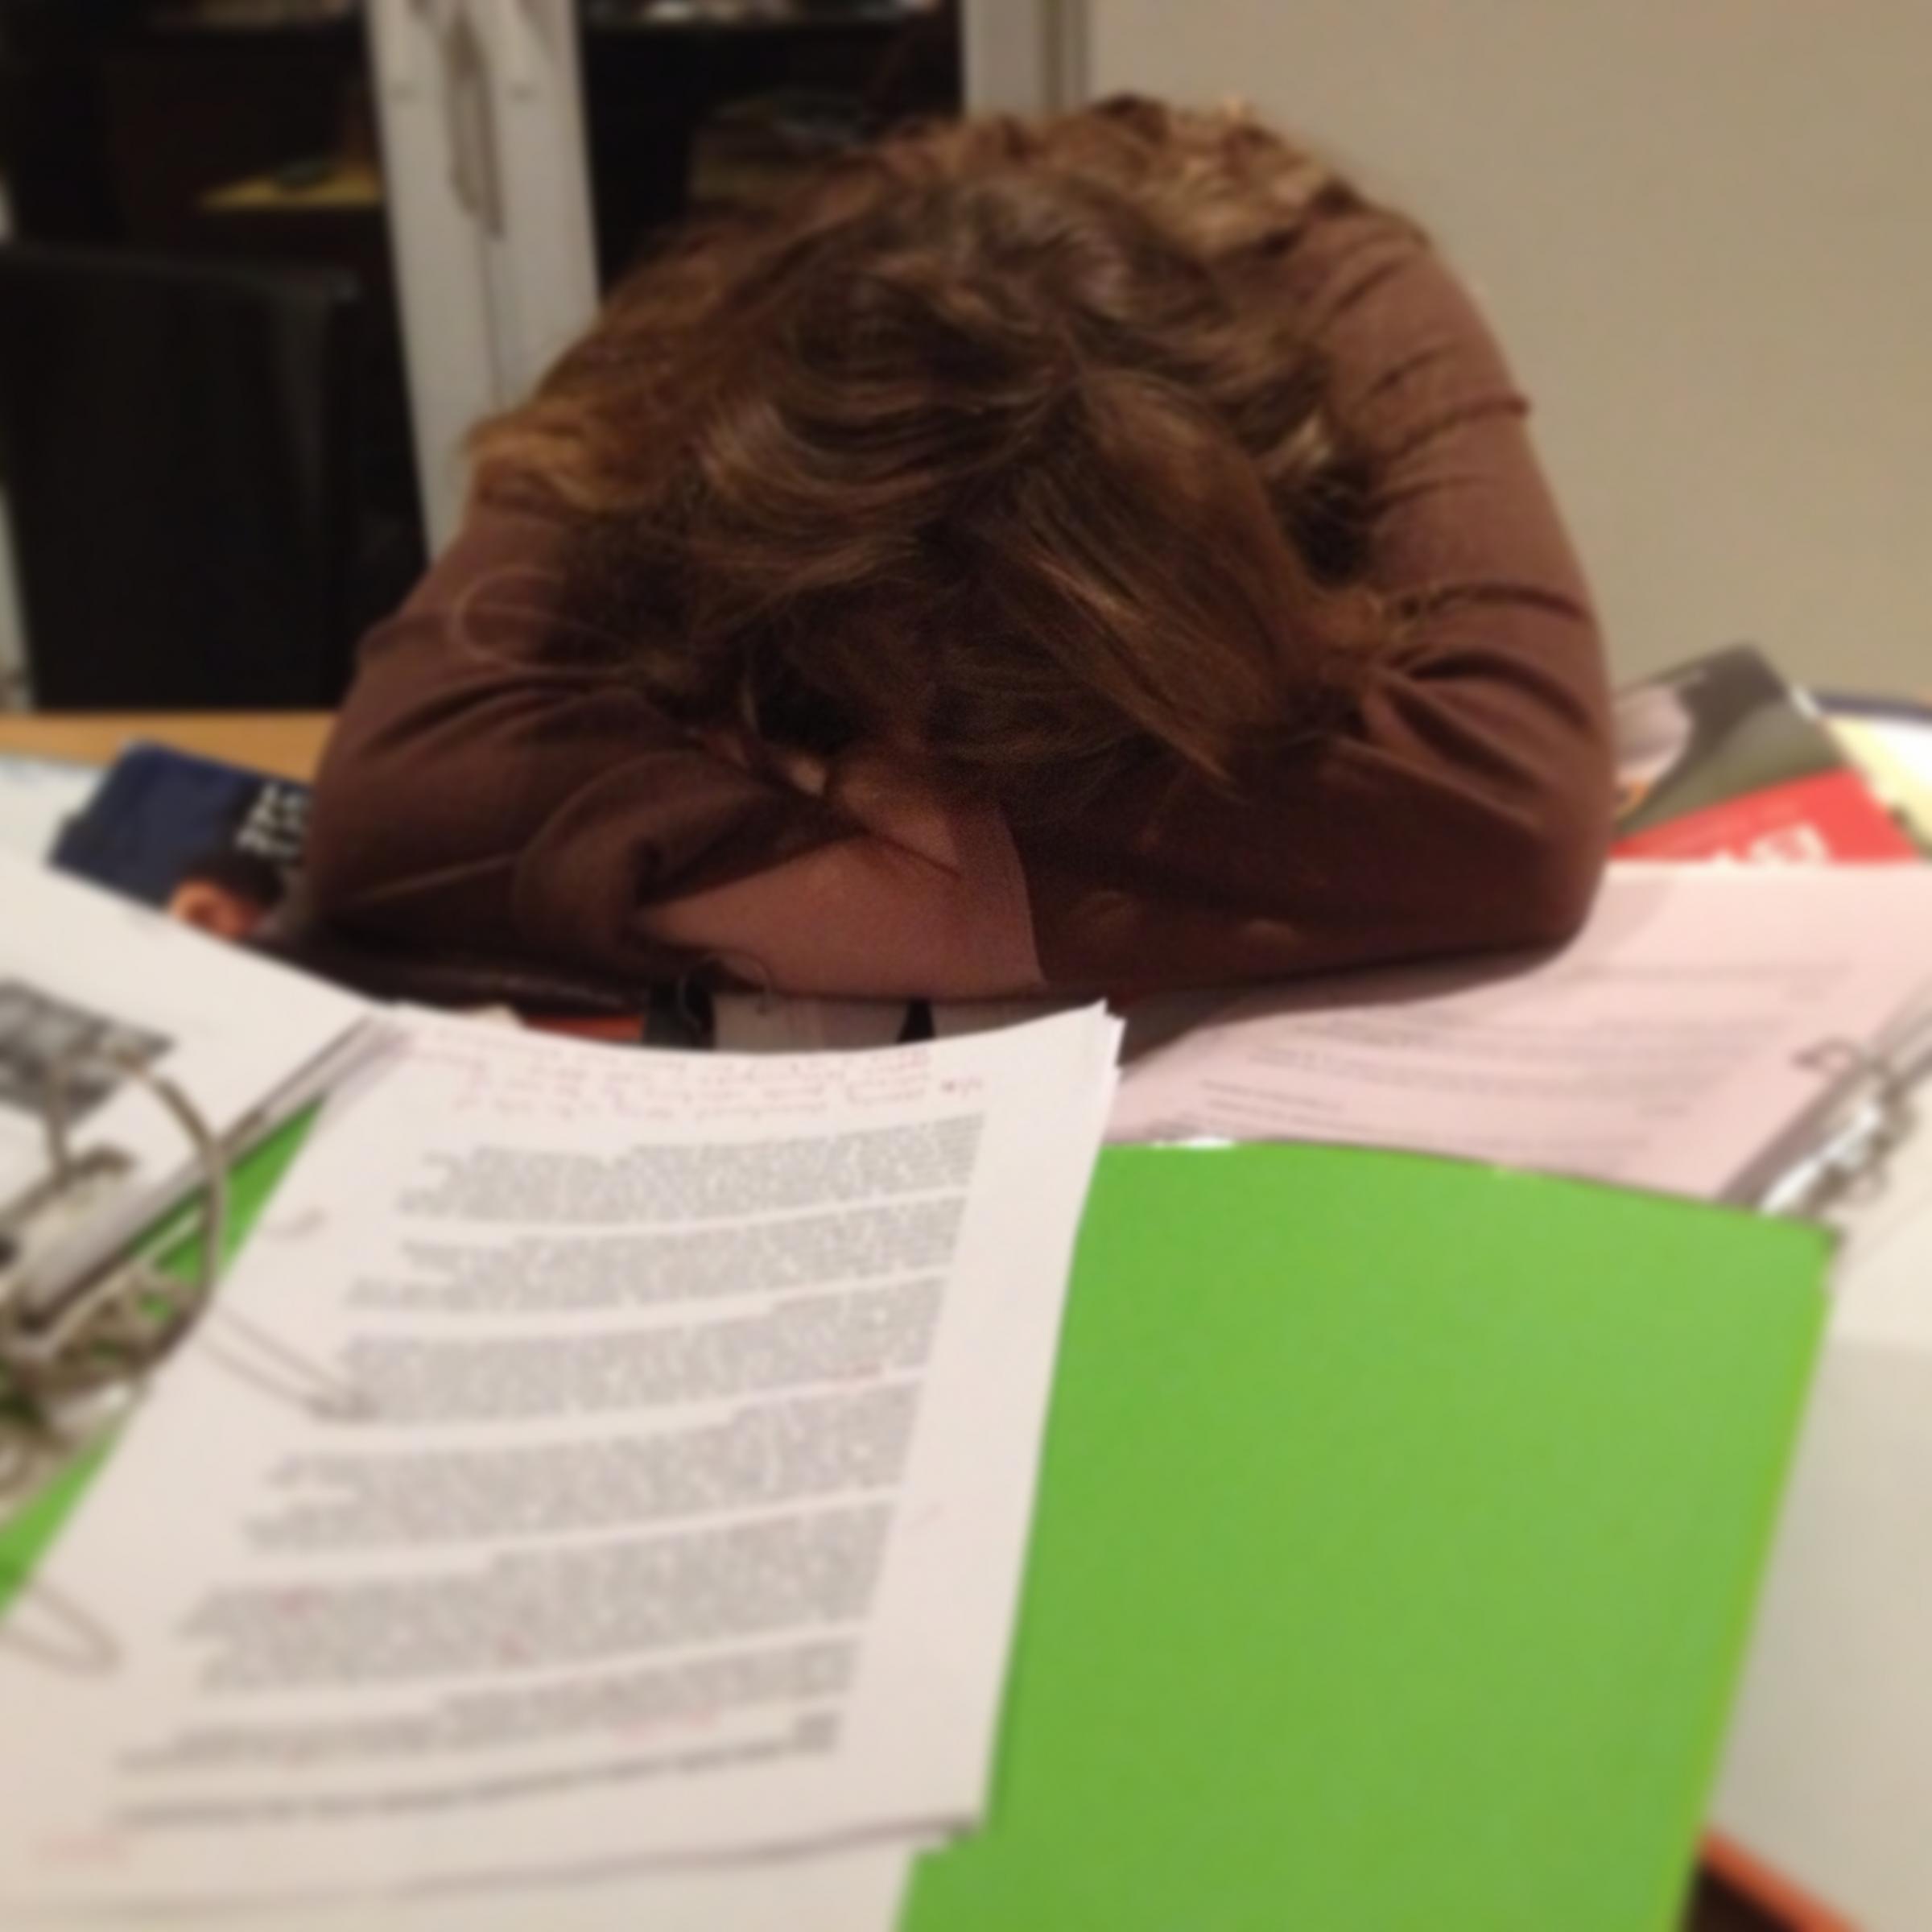 Grade business studies exam/coursework?